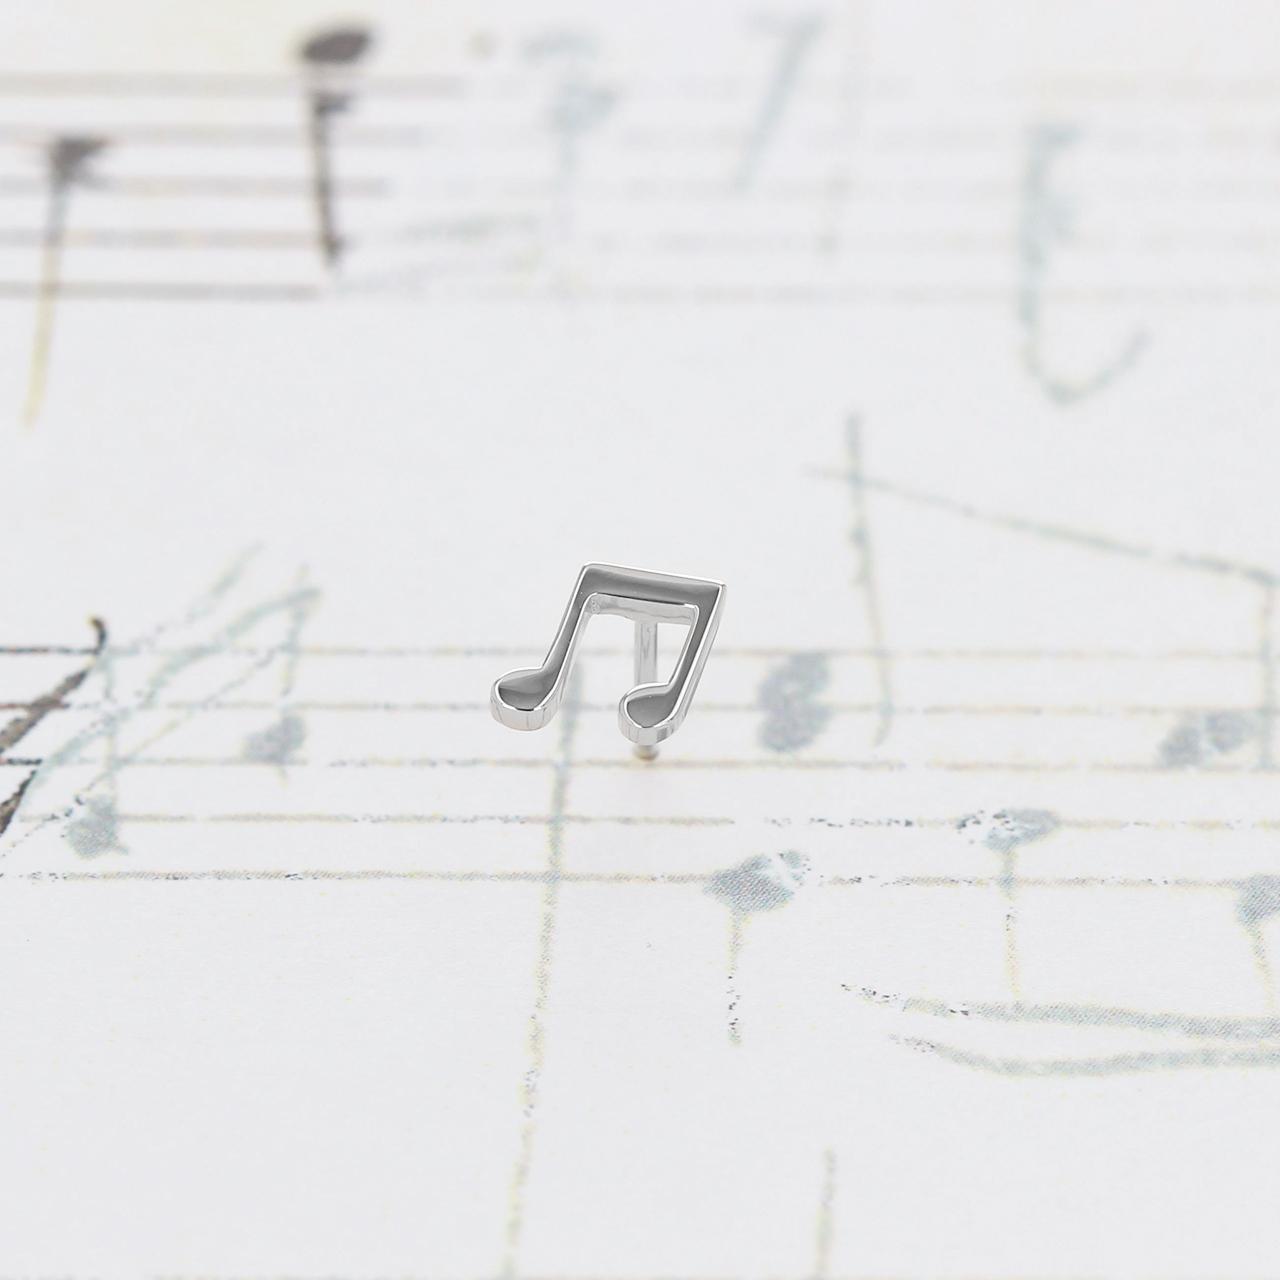 Silver / ピアス (片耳) / 連桁付き8分音符スタッドピアス